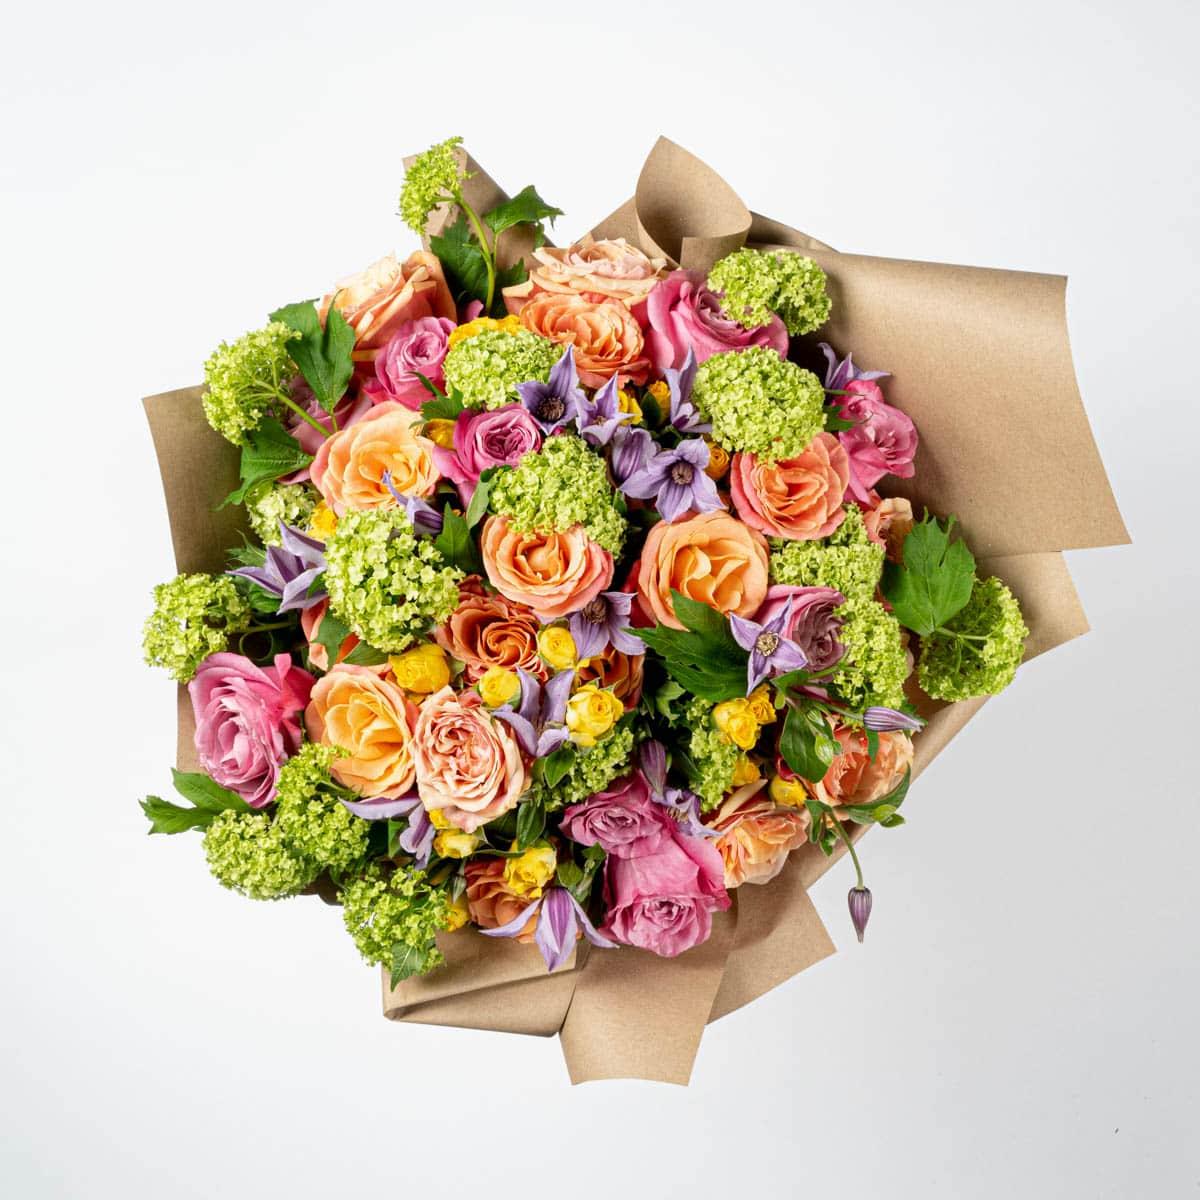 Bloom Flower Delivery | Summer Sunset Bouquet